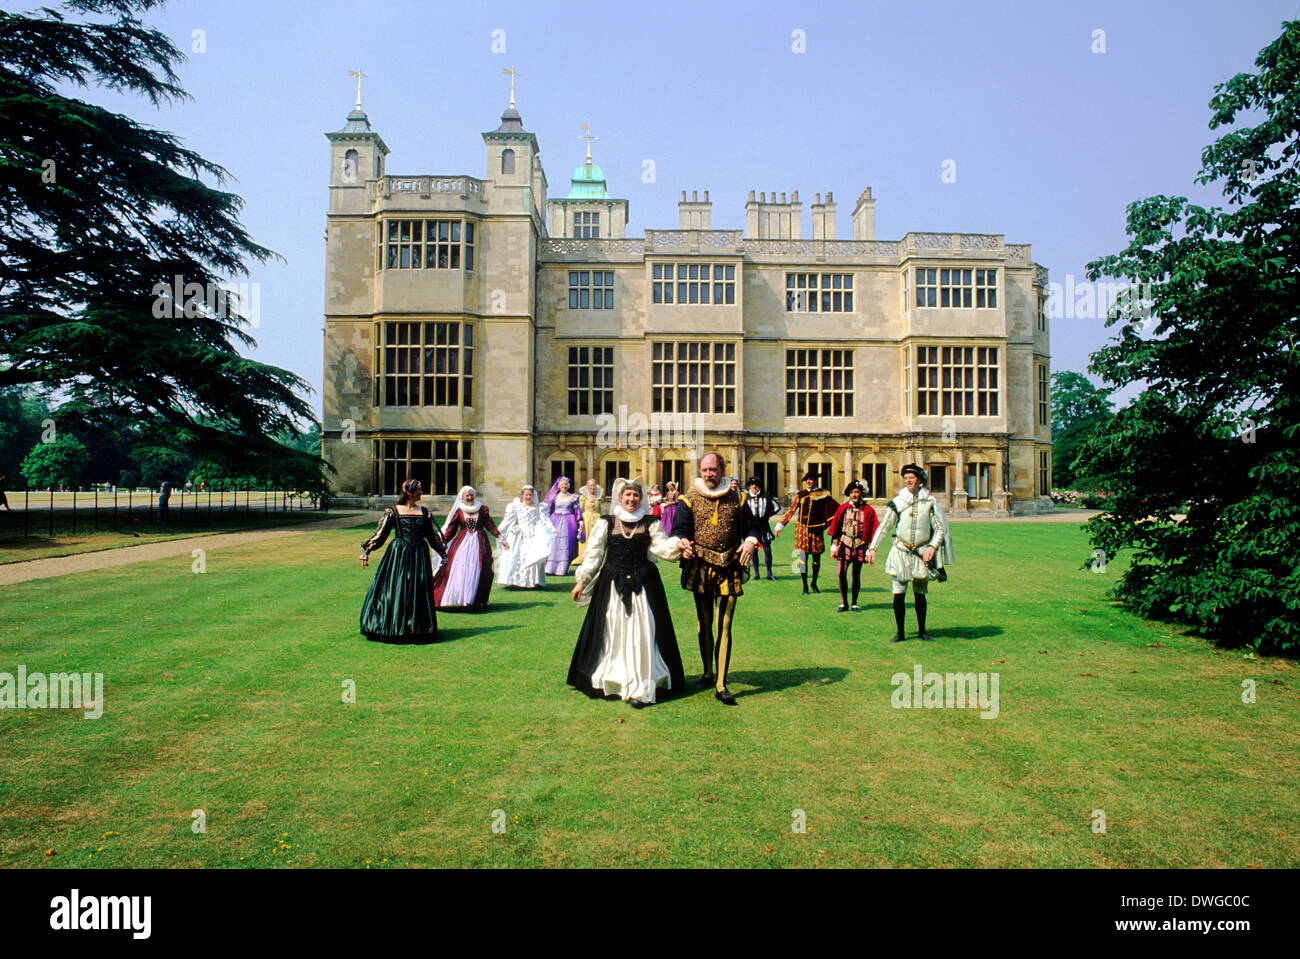 Audley End House, Essex, Kostüm aus dem 16. Jahrhundert Tänzer, Reenactment elisabethanischen Tudor England Stockbild